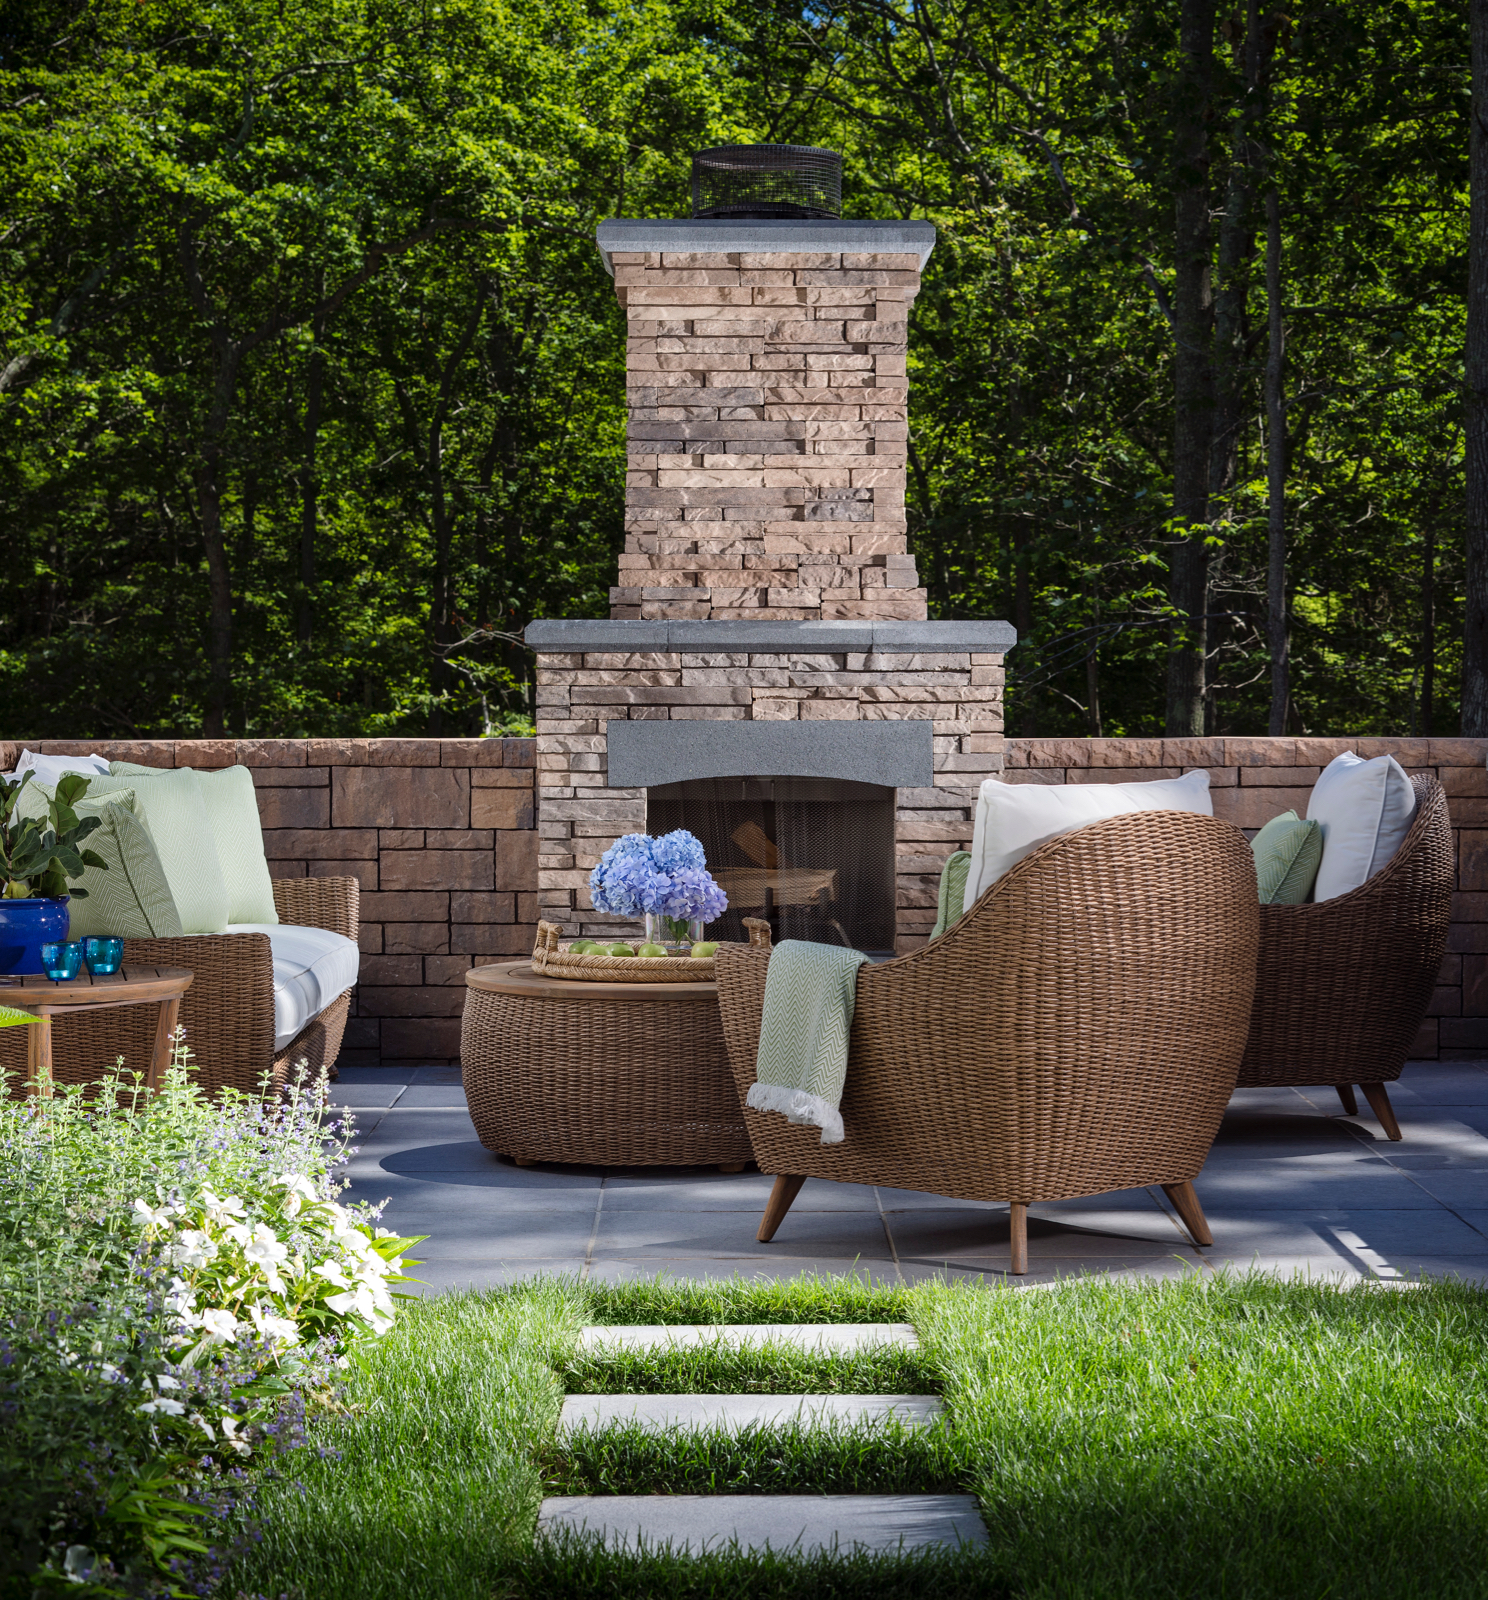 Belgard Pavers Bordeaux Outdoor Elements; Belgard Pavers Bordeaux Outdoor  Elements ...